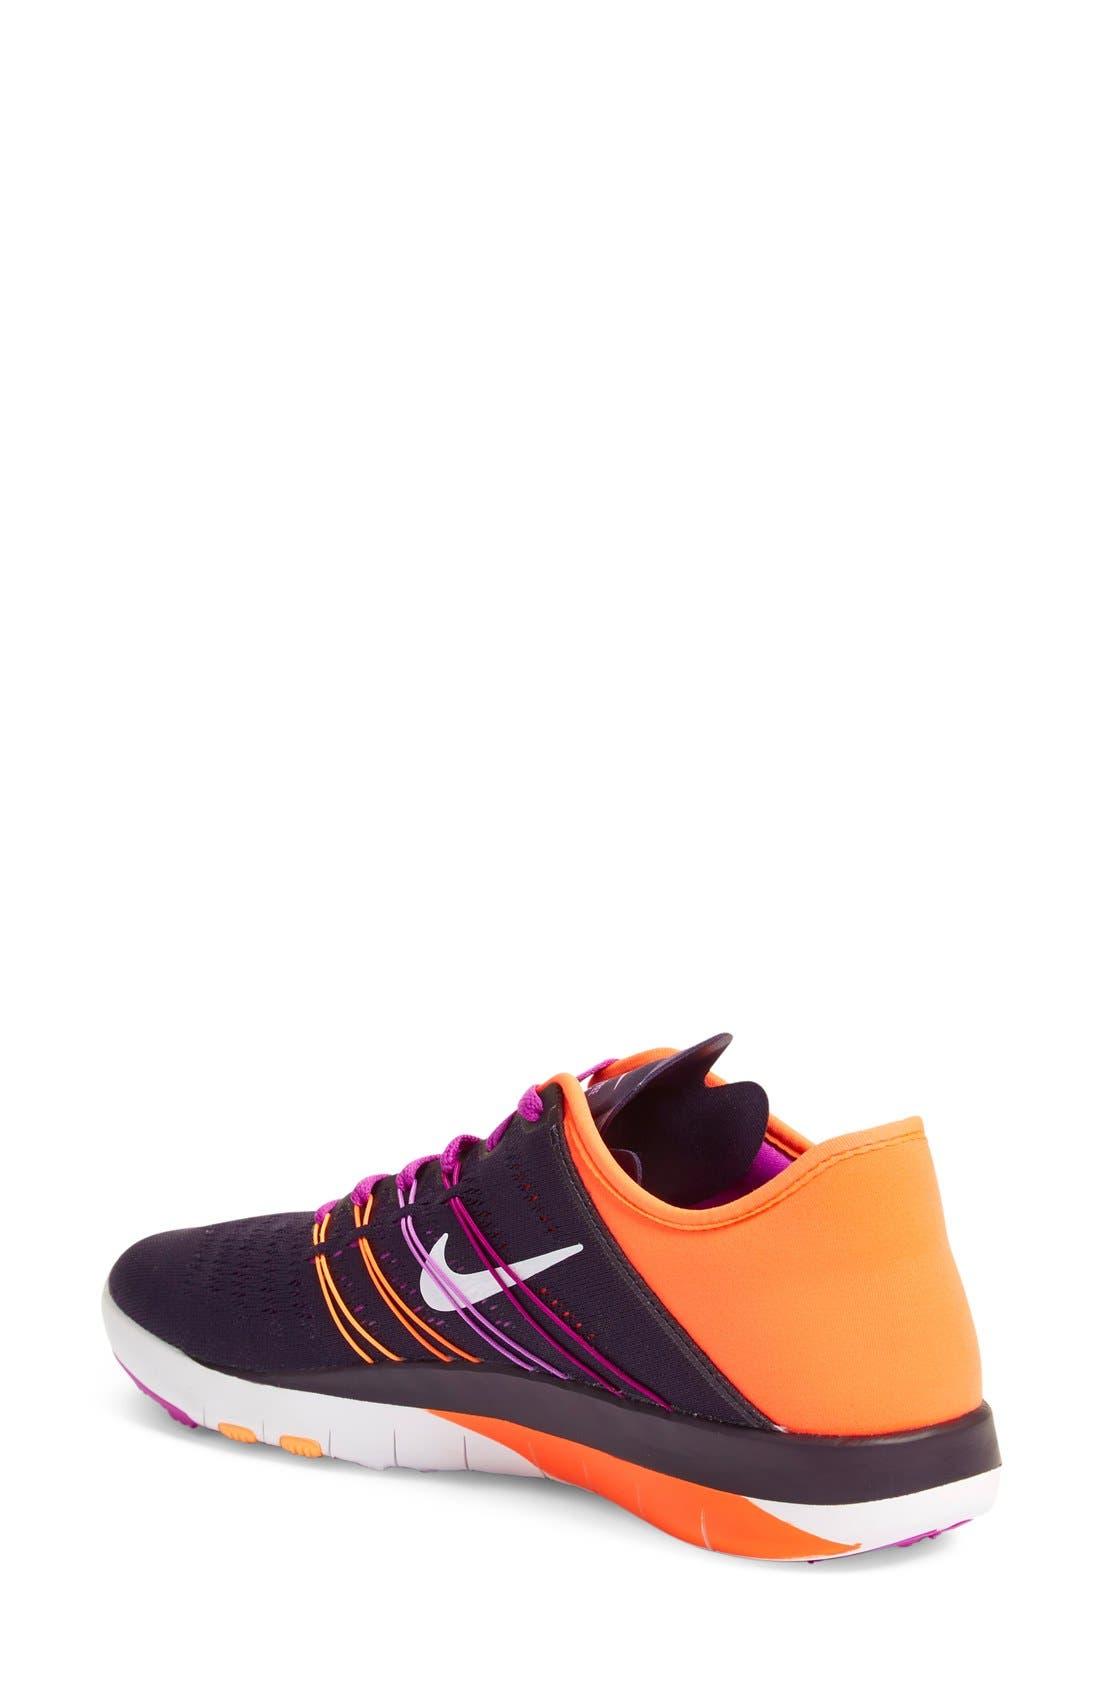 Free TR Fit 6 Training Shoe,                             Alternate thumbnail 2, color,                             Violet/ White/ Crimson